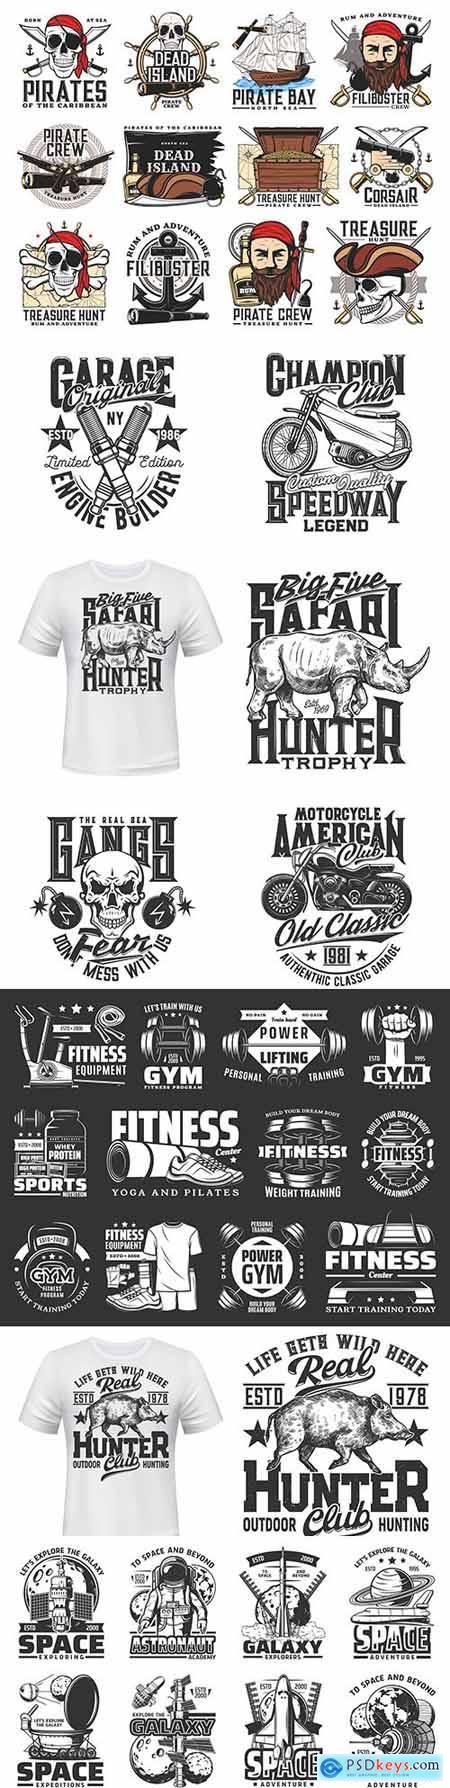 Print on T-shirt with mascot and biker club design emblem